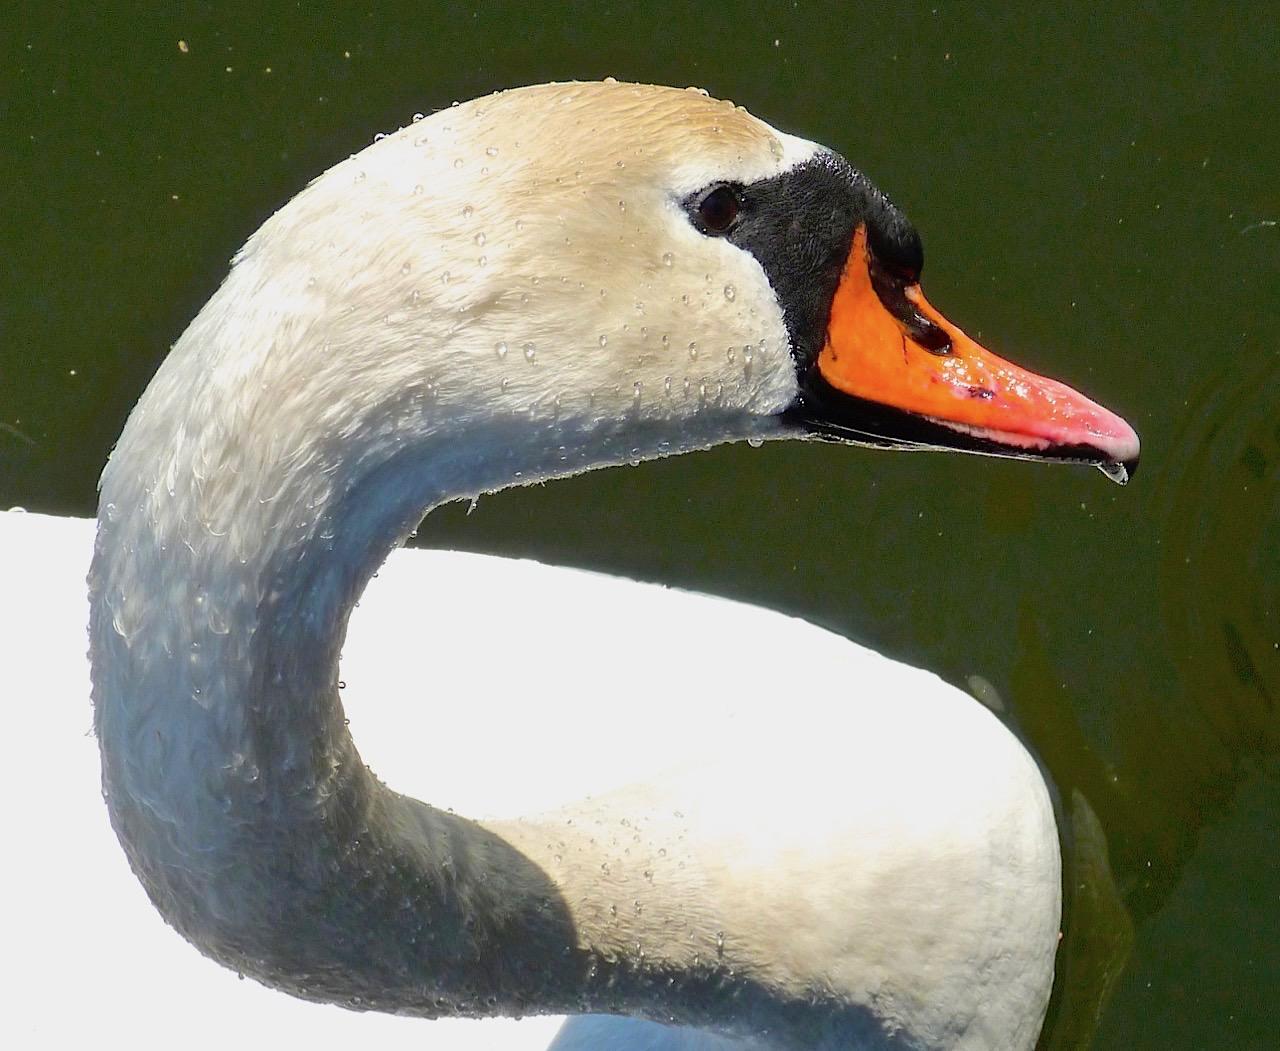 Swan Neck, Prospect Park NYC (Keith Salvesen Photography)